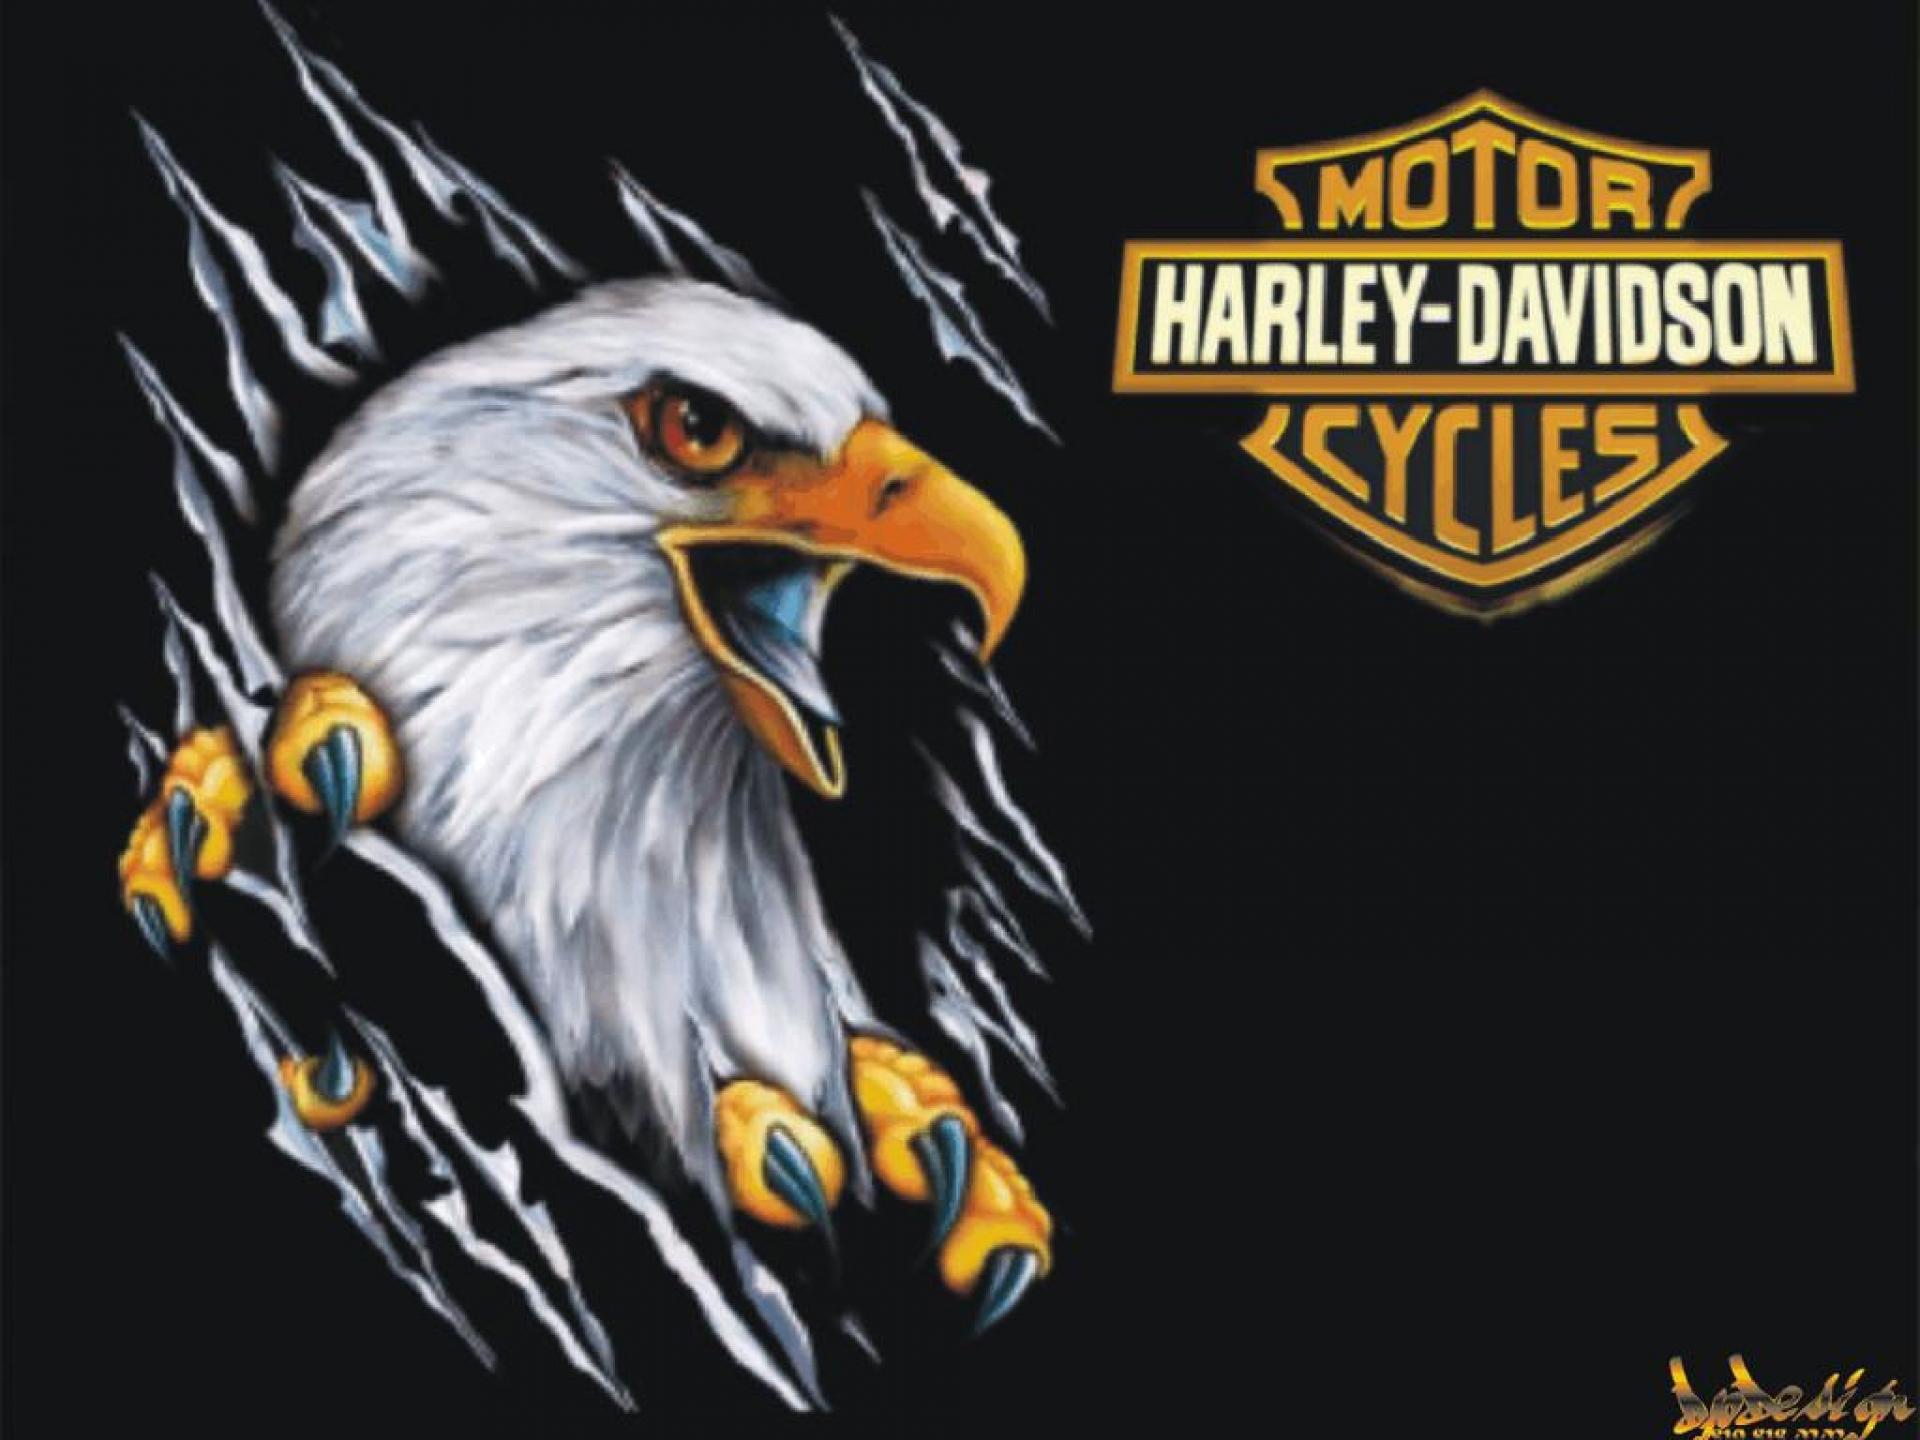 vintage harley davidson logo | eBay